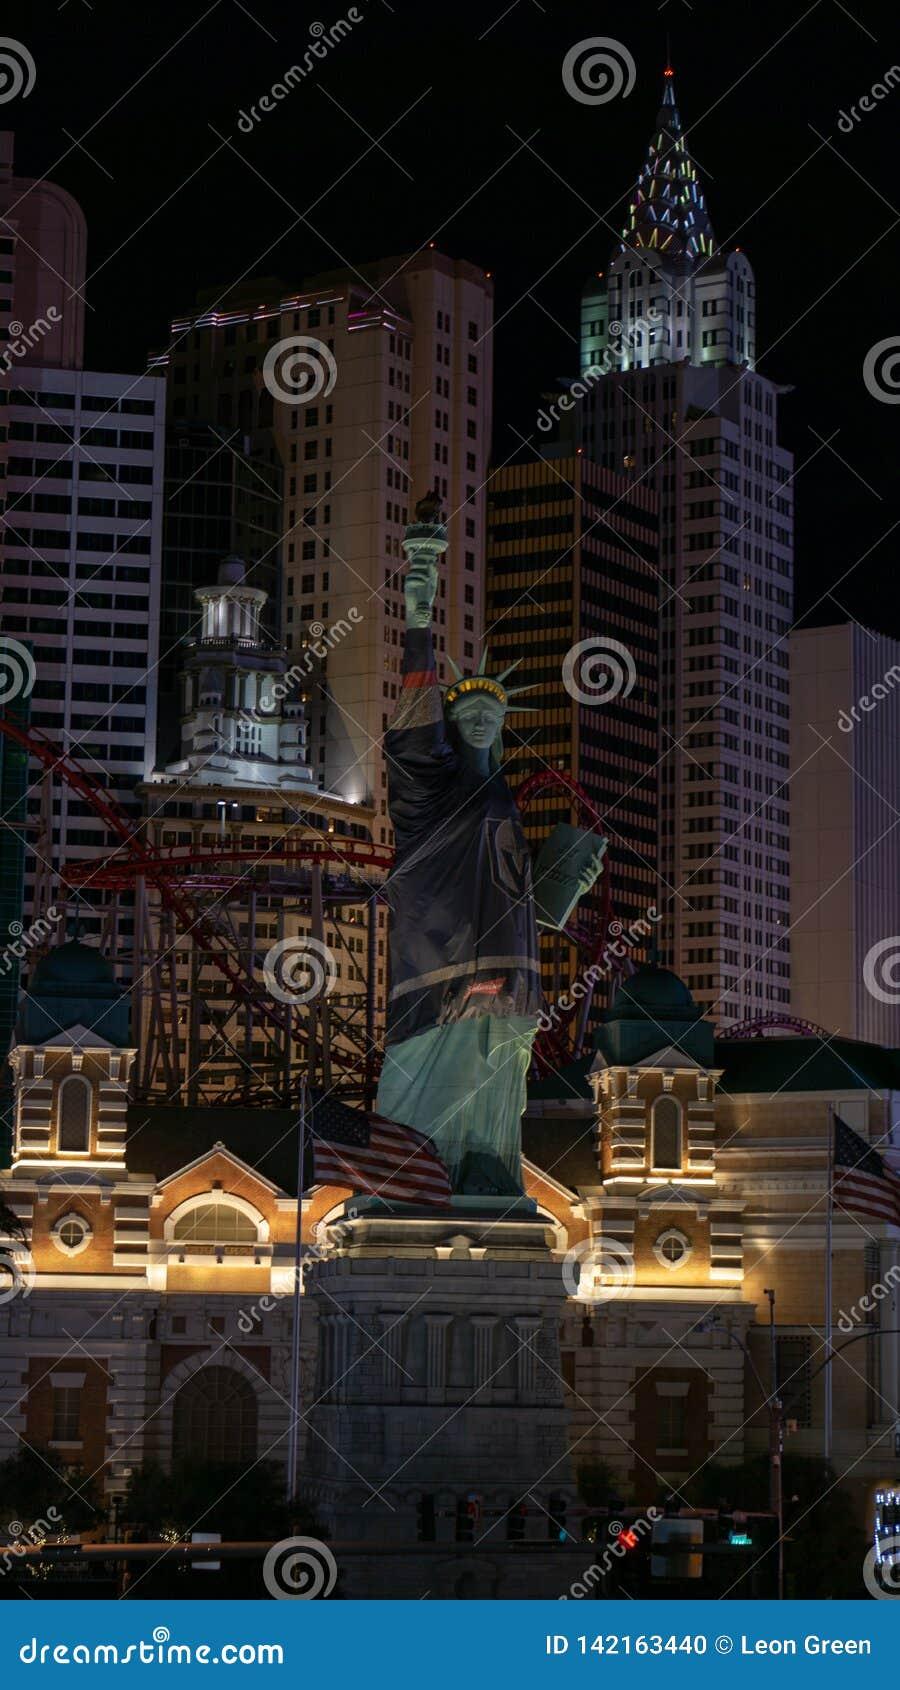 3 mars 2019 - hôtel et casino de Las Vegas, Nevada - de New York, New York